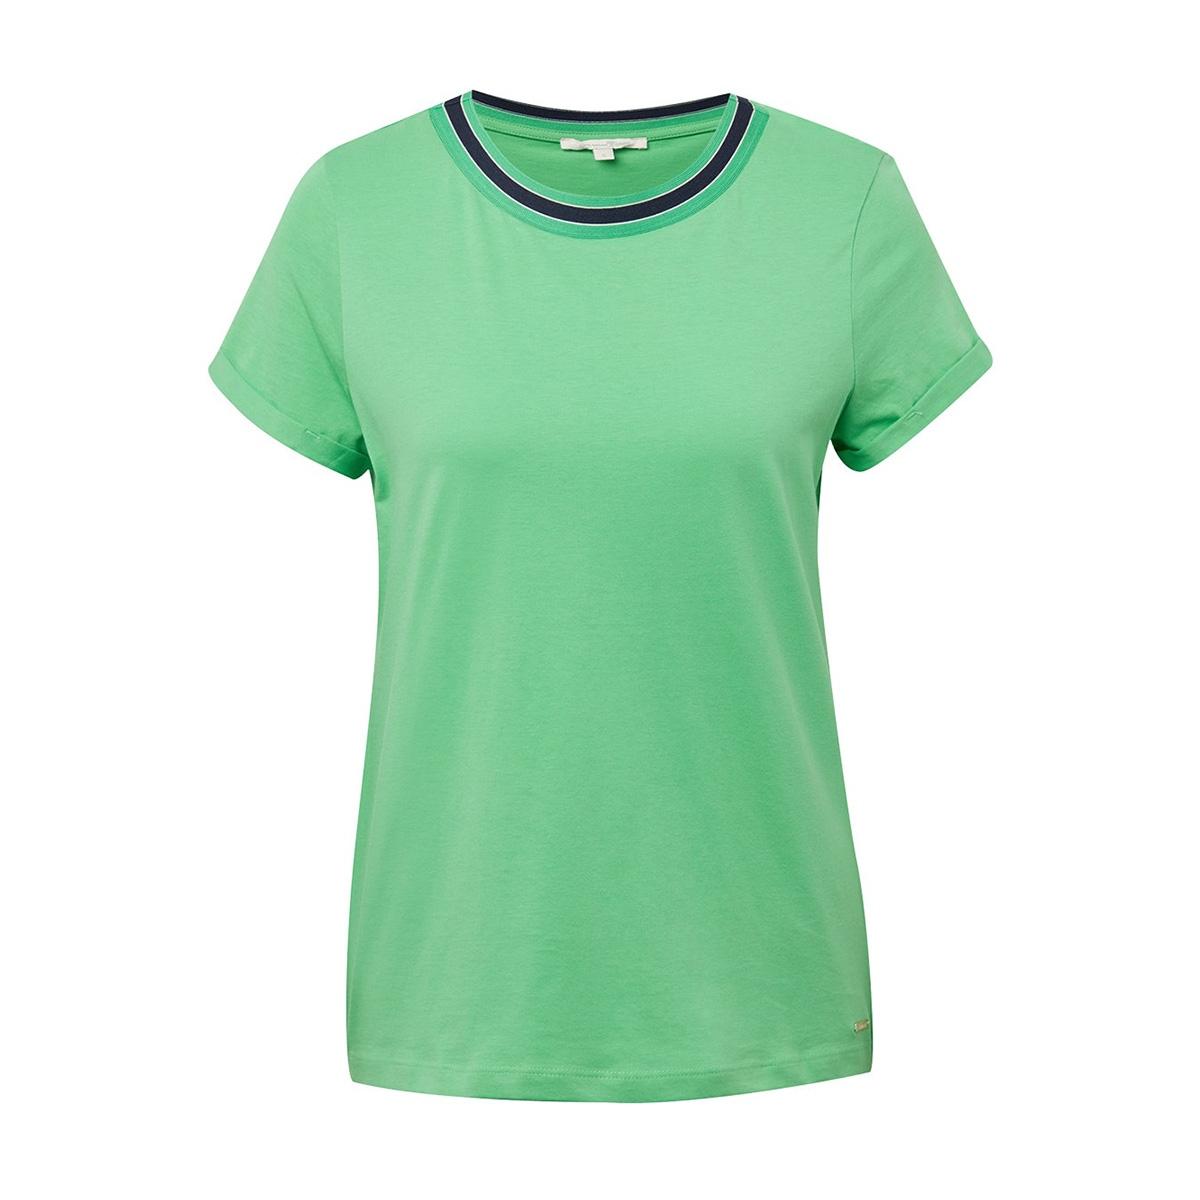 1009066xx71 tom tailor t-shirt 11052